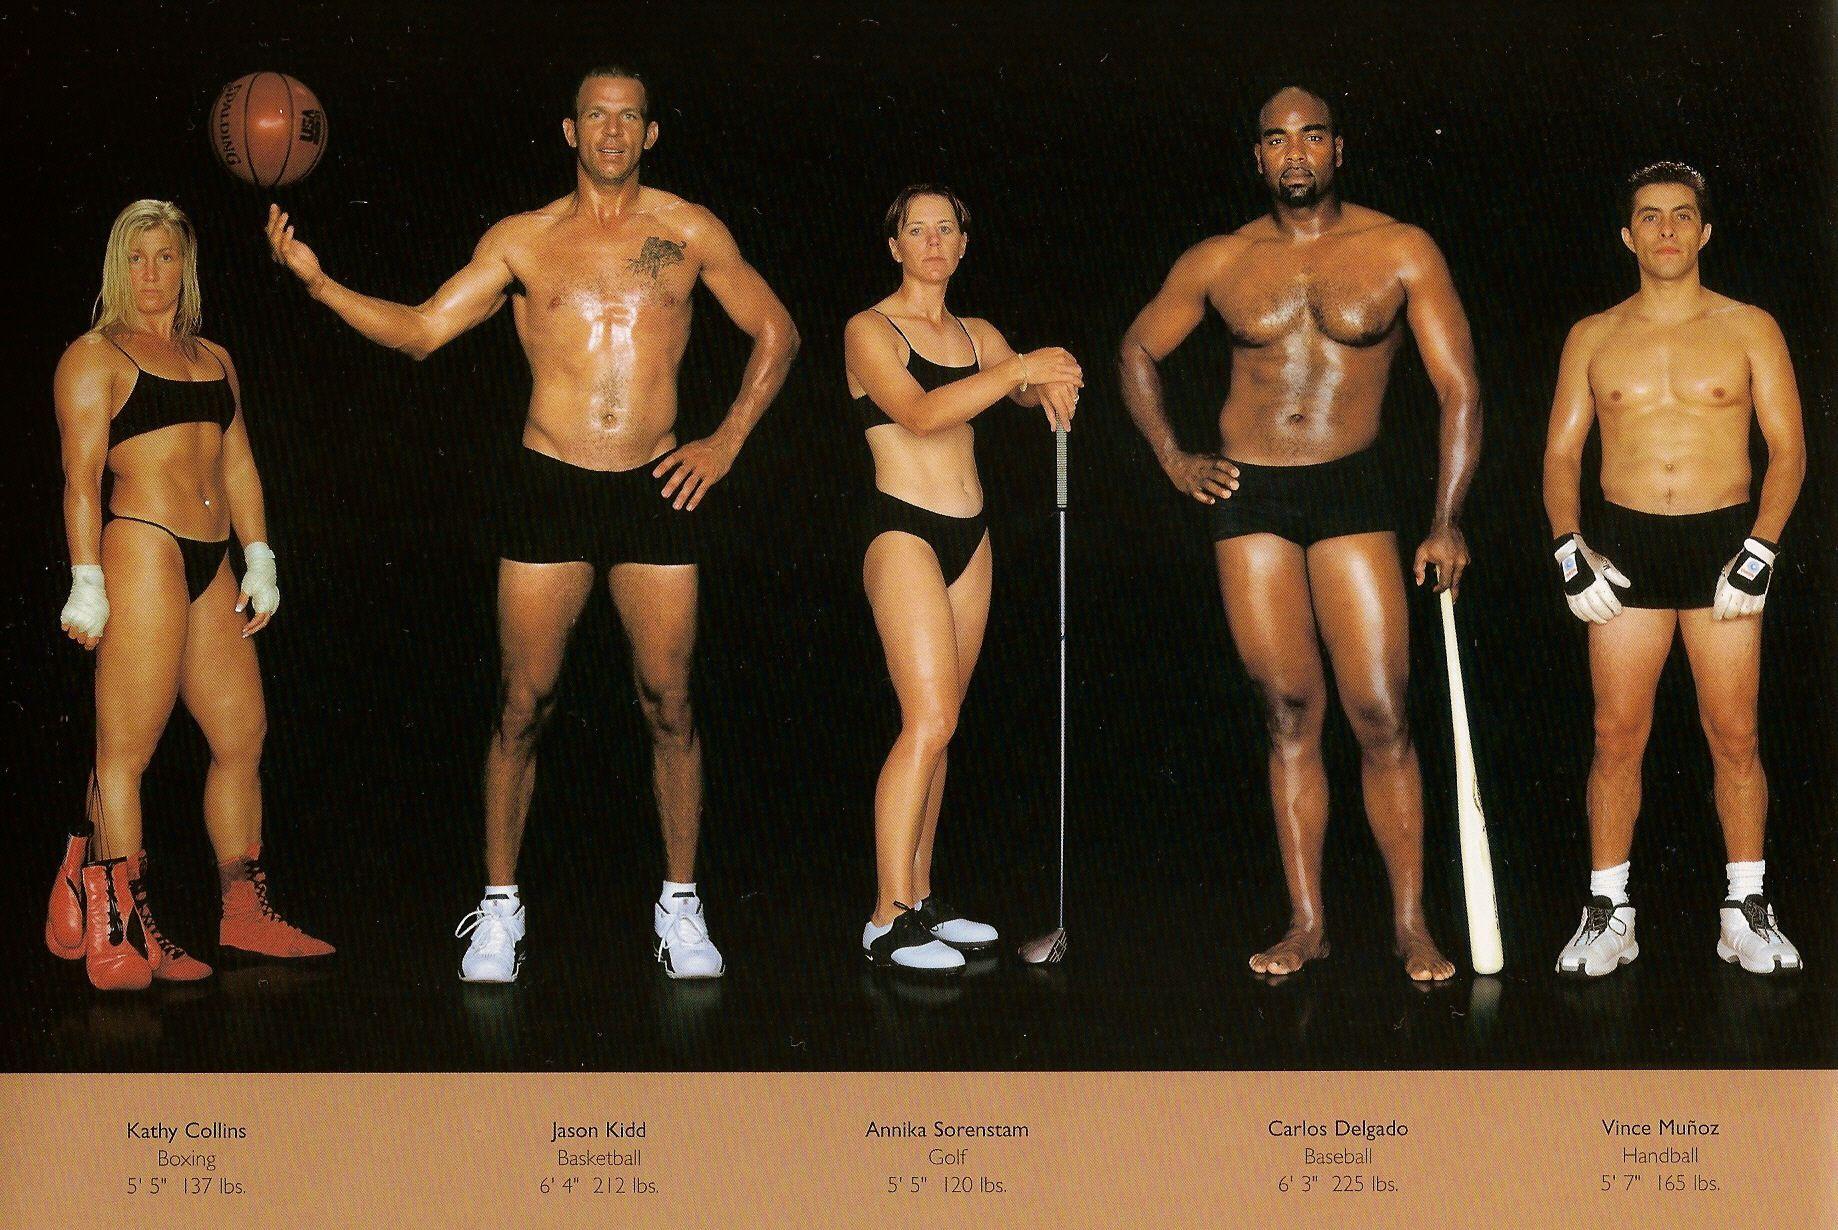 Howard Schatz / слева направо: бокс, баскетбол, гольф, бейсбол, гандбол.